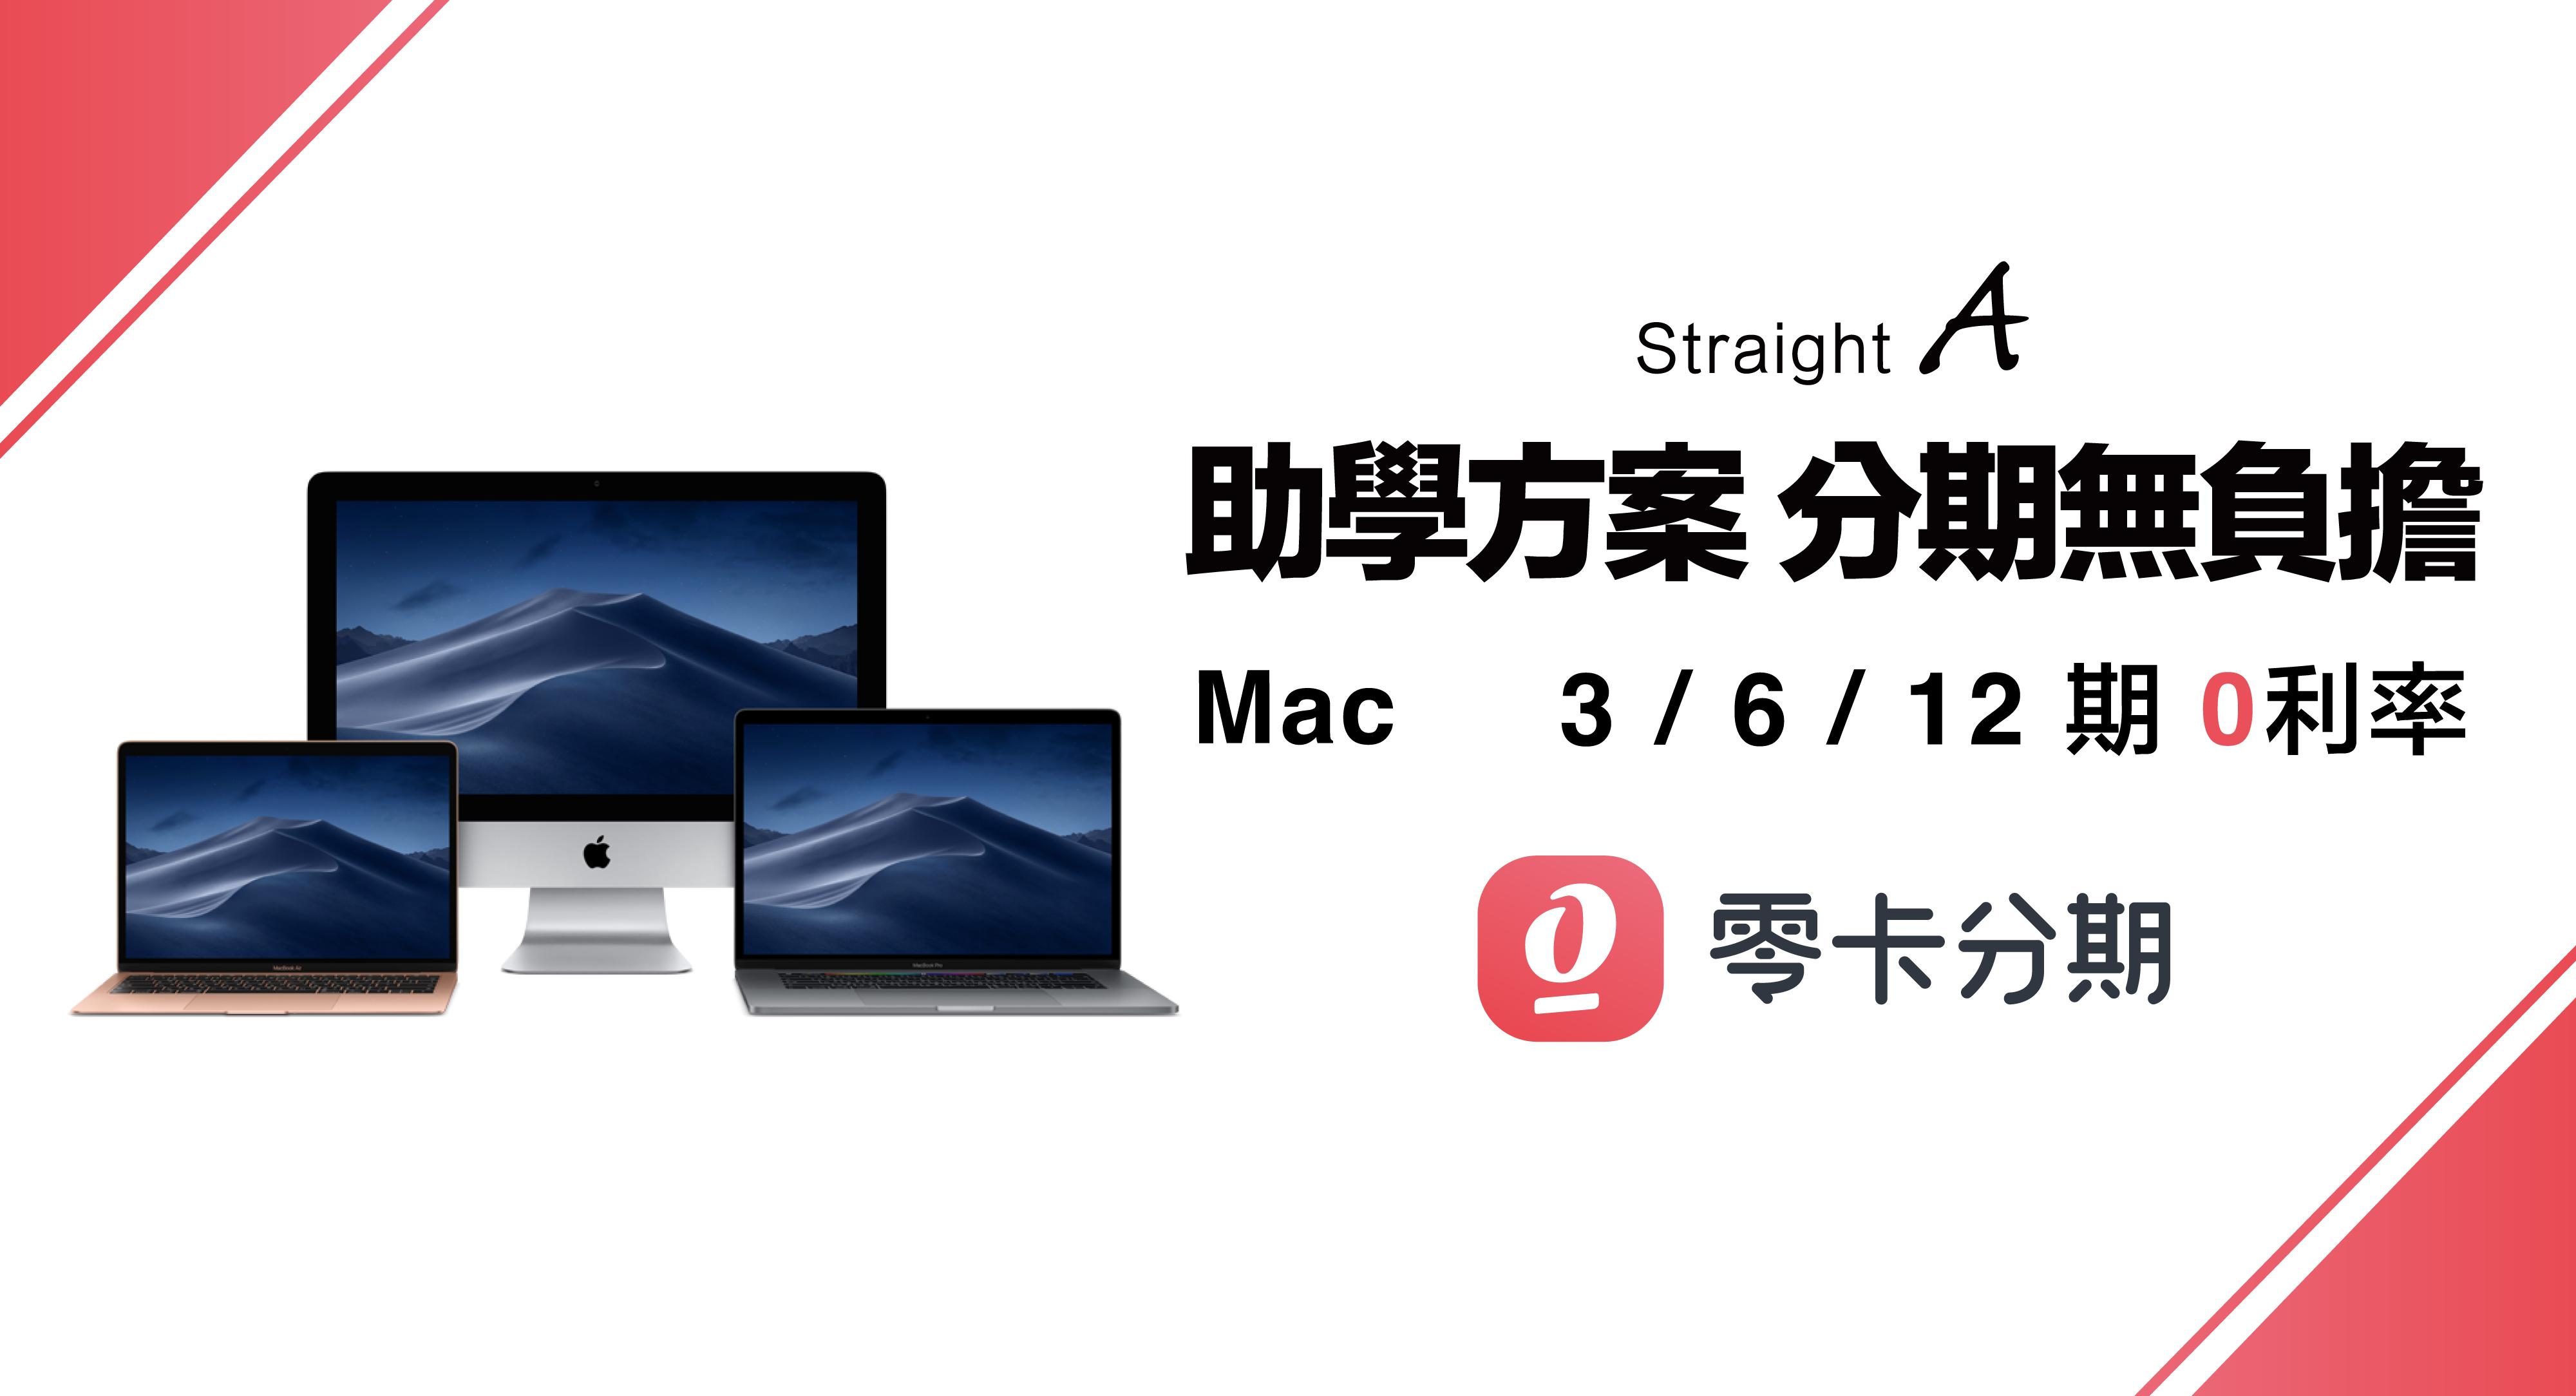 Apple, 送滑鼠, Mac, 教育價, 無卡, 免信用卡, 分期, 0利率 ,0利息